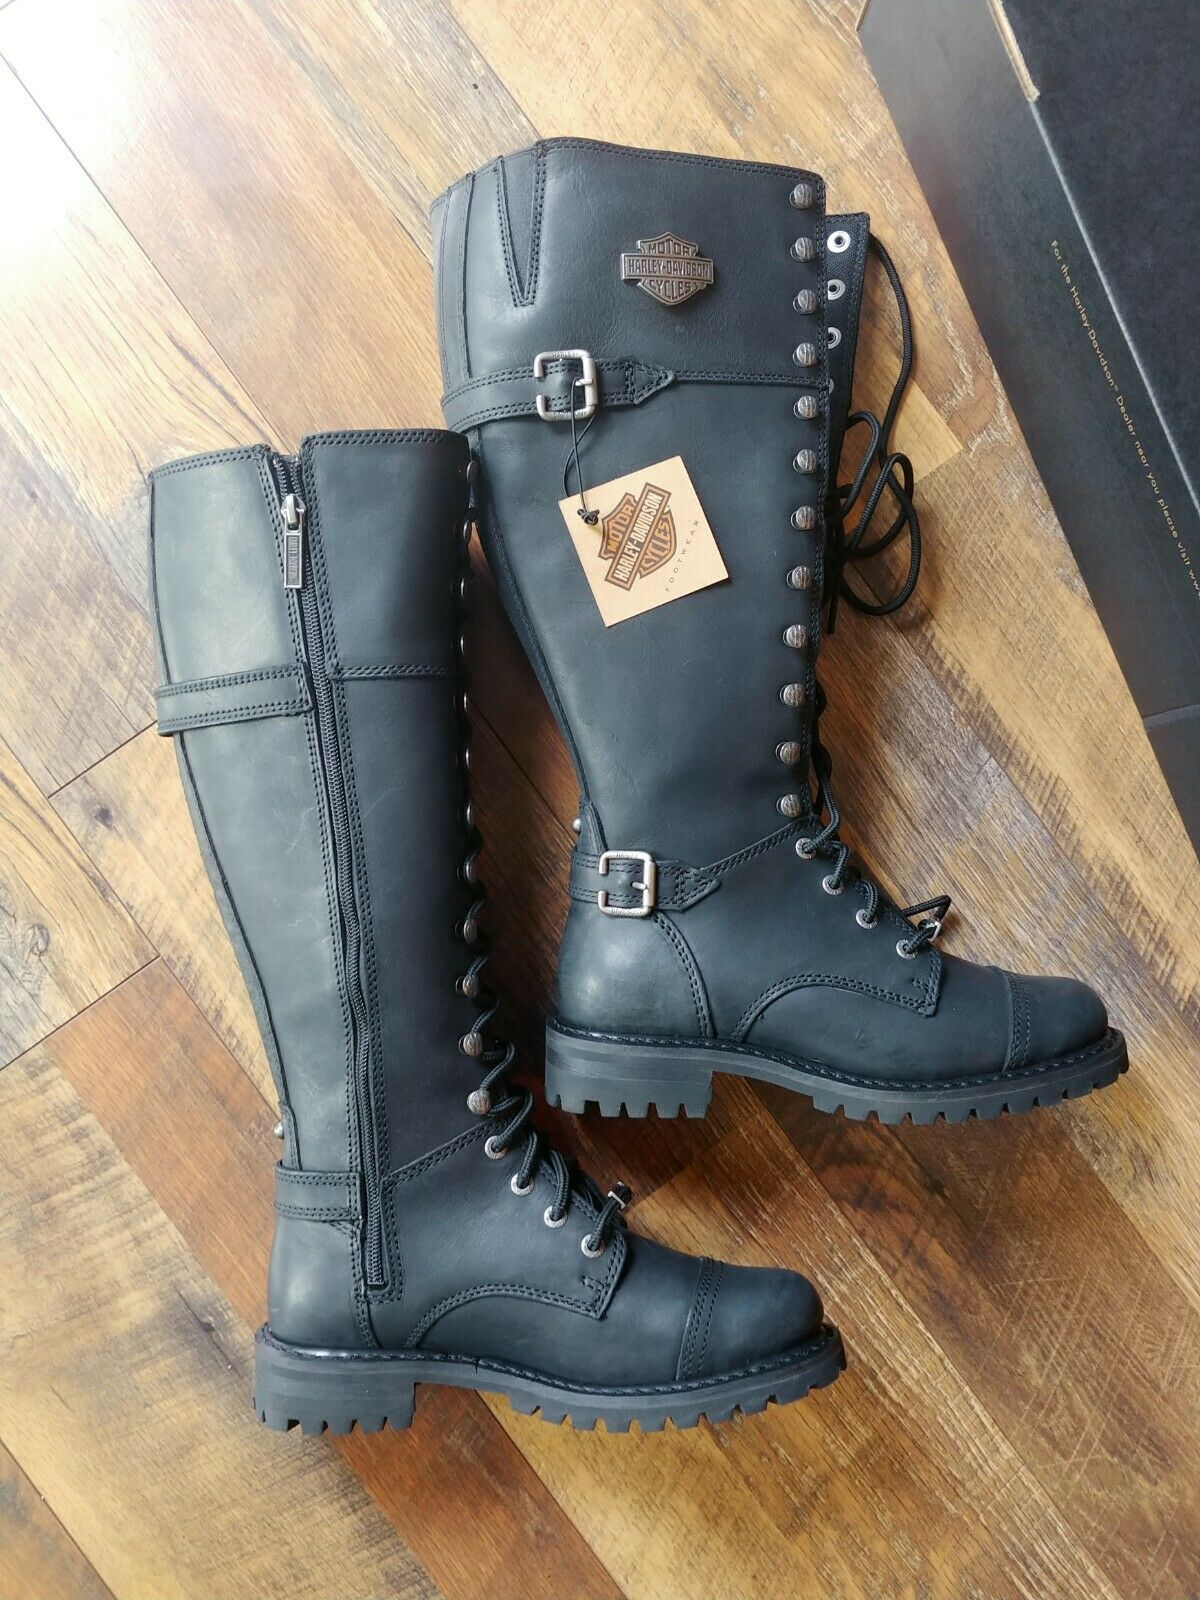 Harley-Davidson Women 6m Beechwood black hi boot 16  lace & cap toe motorcycle